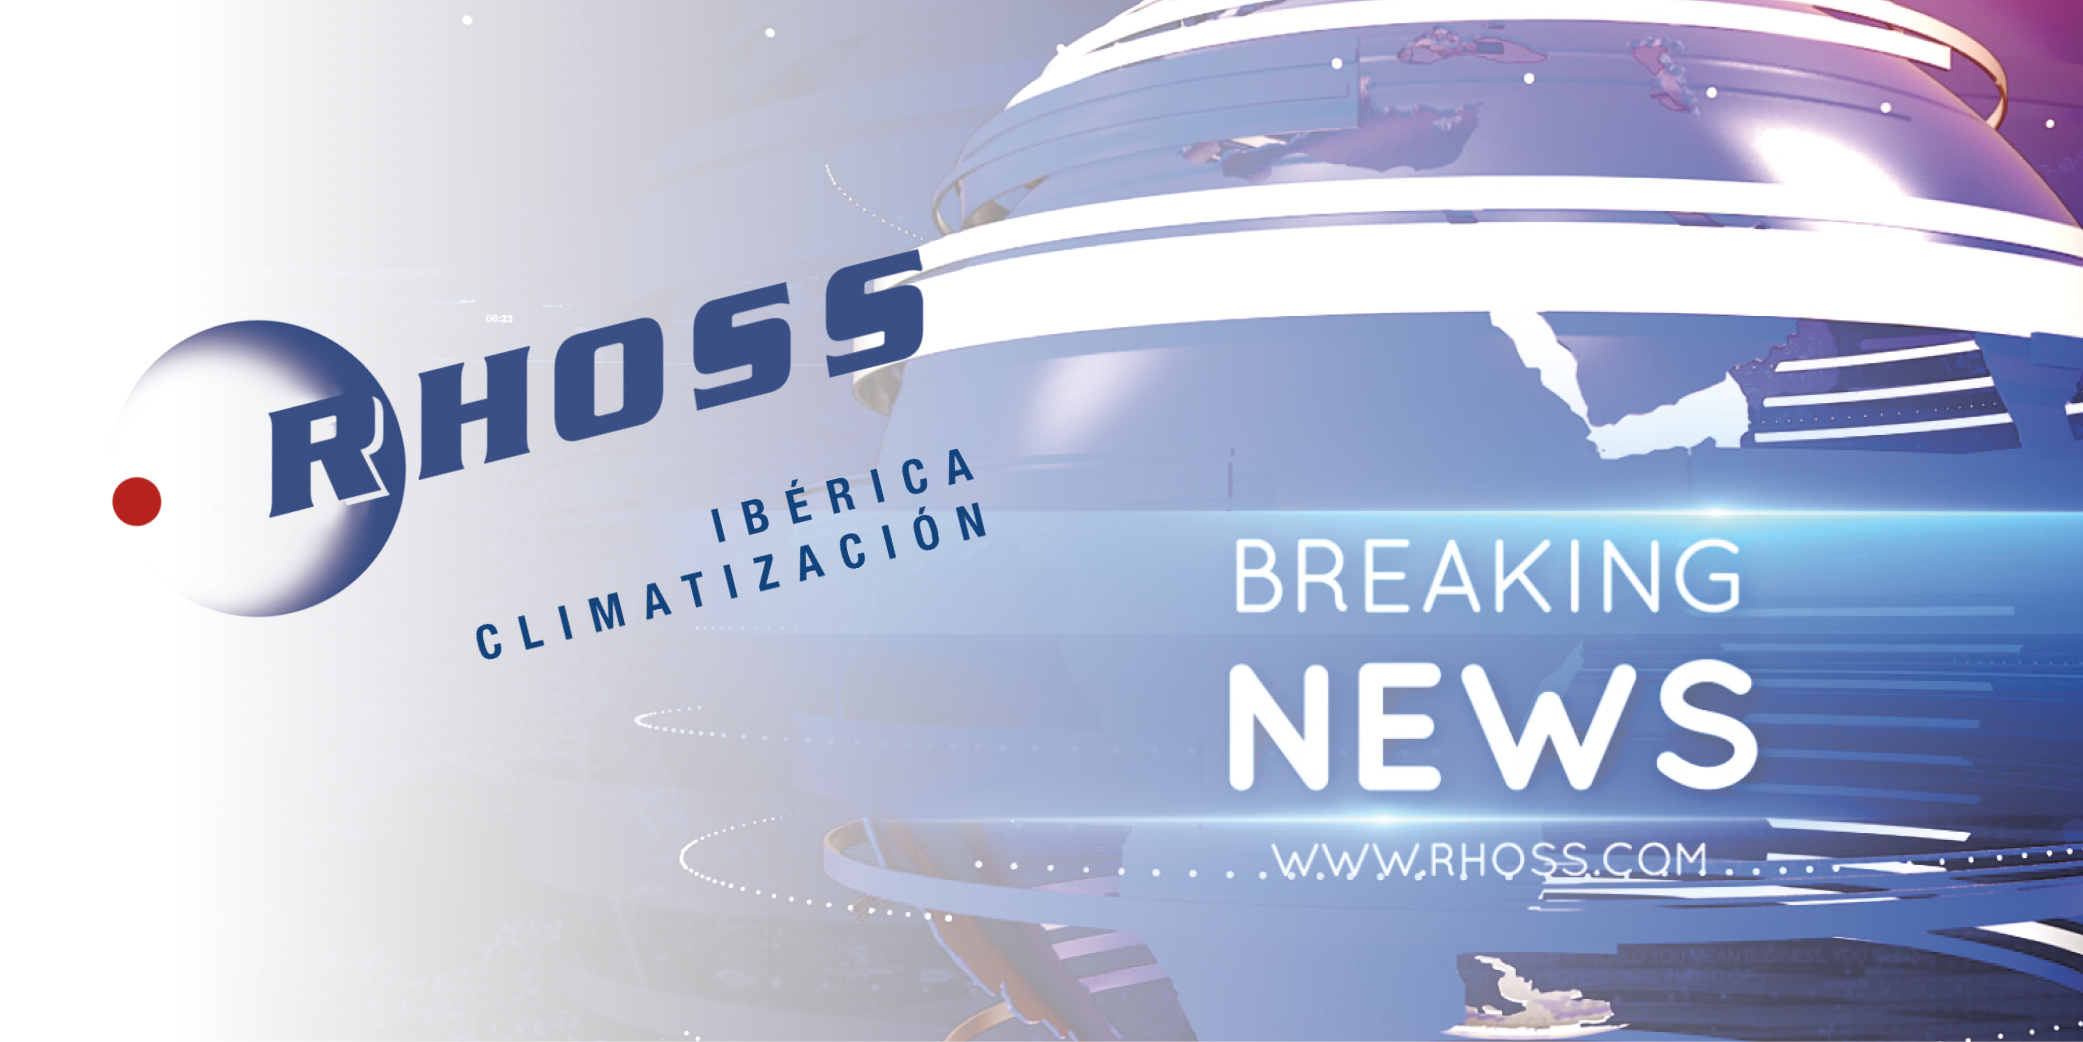 Rhoss to acquire shares in Rhoss Ibérica Climatizaciòn